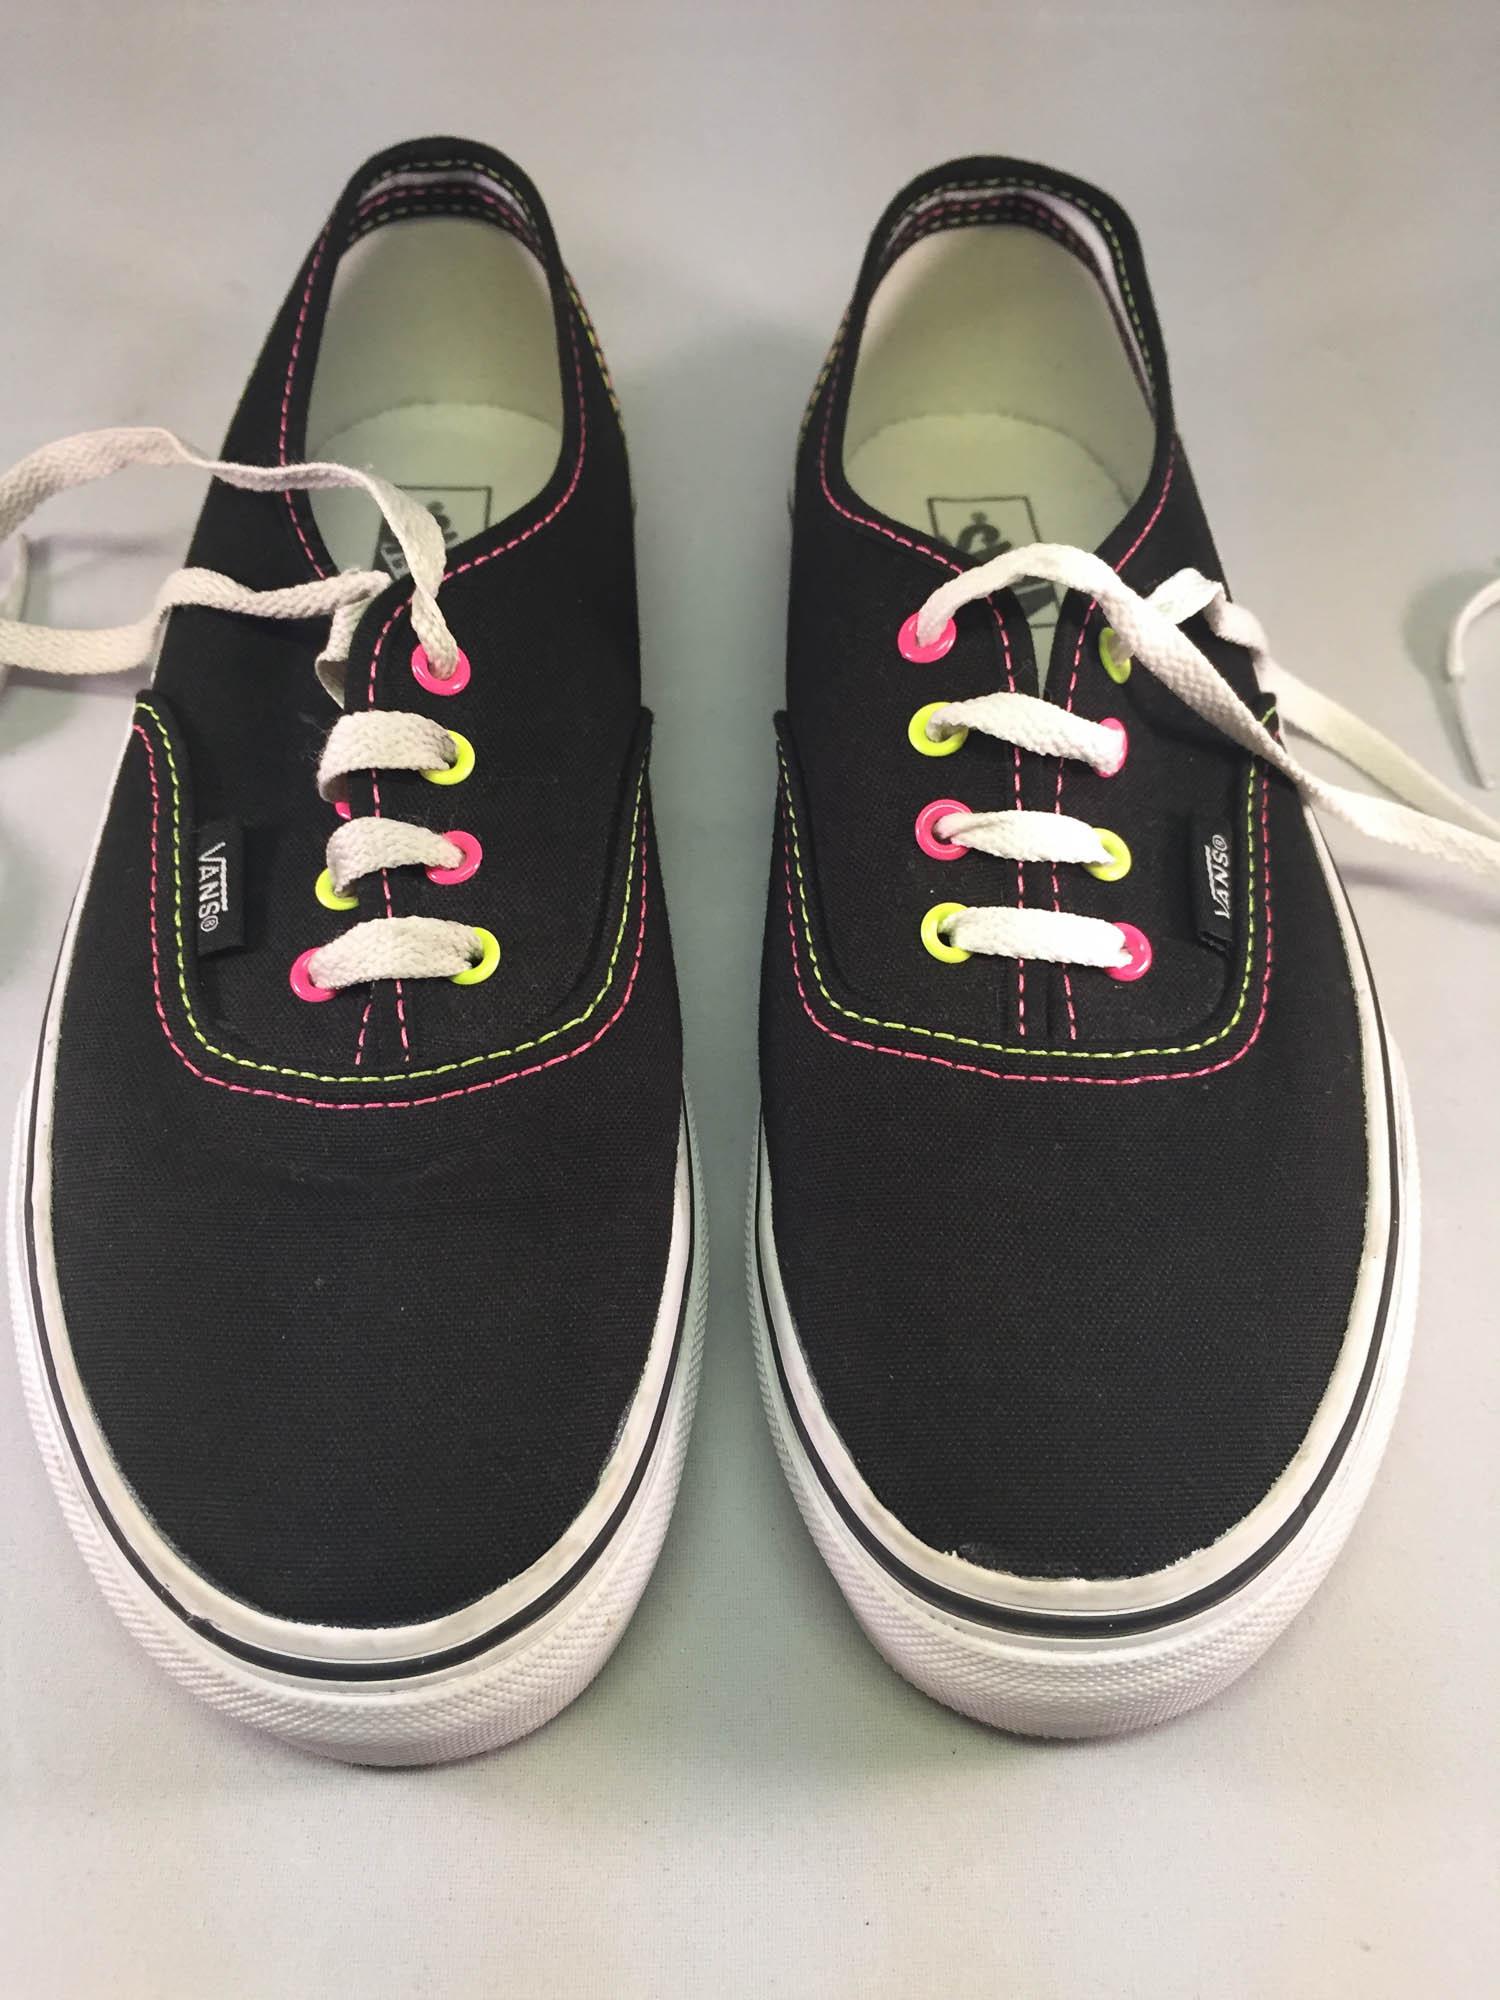 Black Vans w/ Neon Pink and Yellow